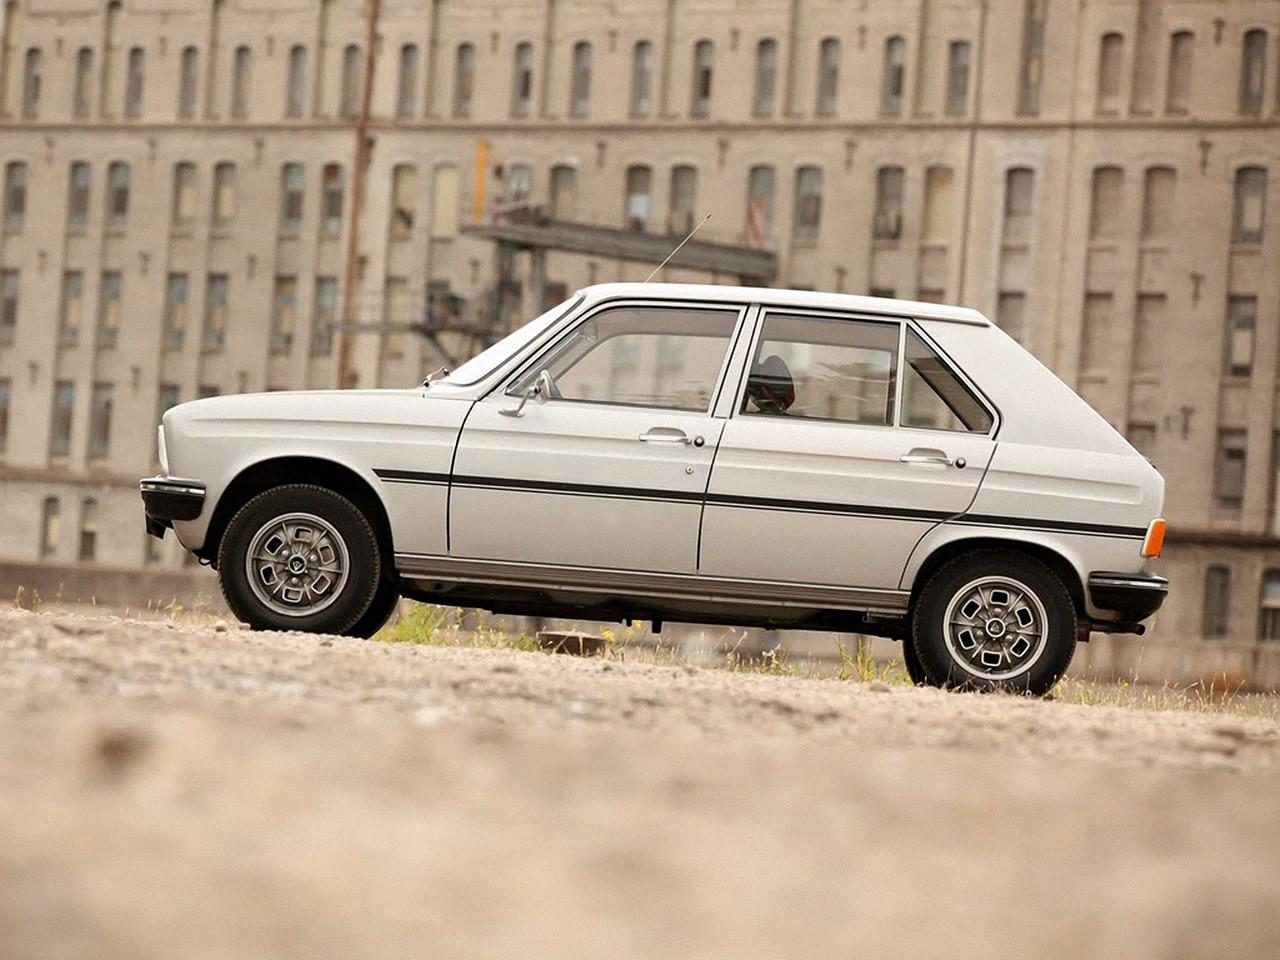 Plug In Hybrid Cars >> PEUGEOT 104 specs - 1972, 1973, 1974, 1975, 1976, 1977, 1978, 1979, 1980, 1981, 1982, 1983, 1984 ...